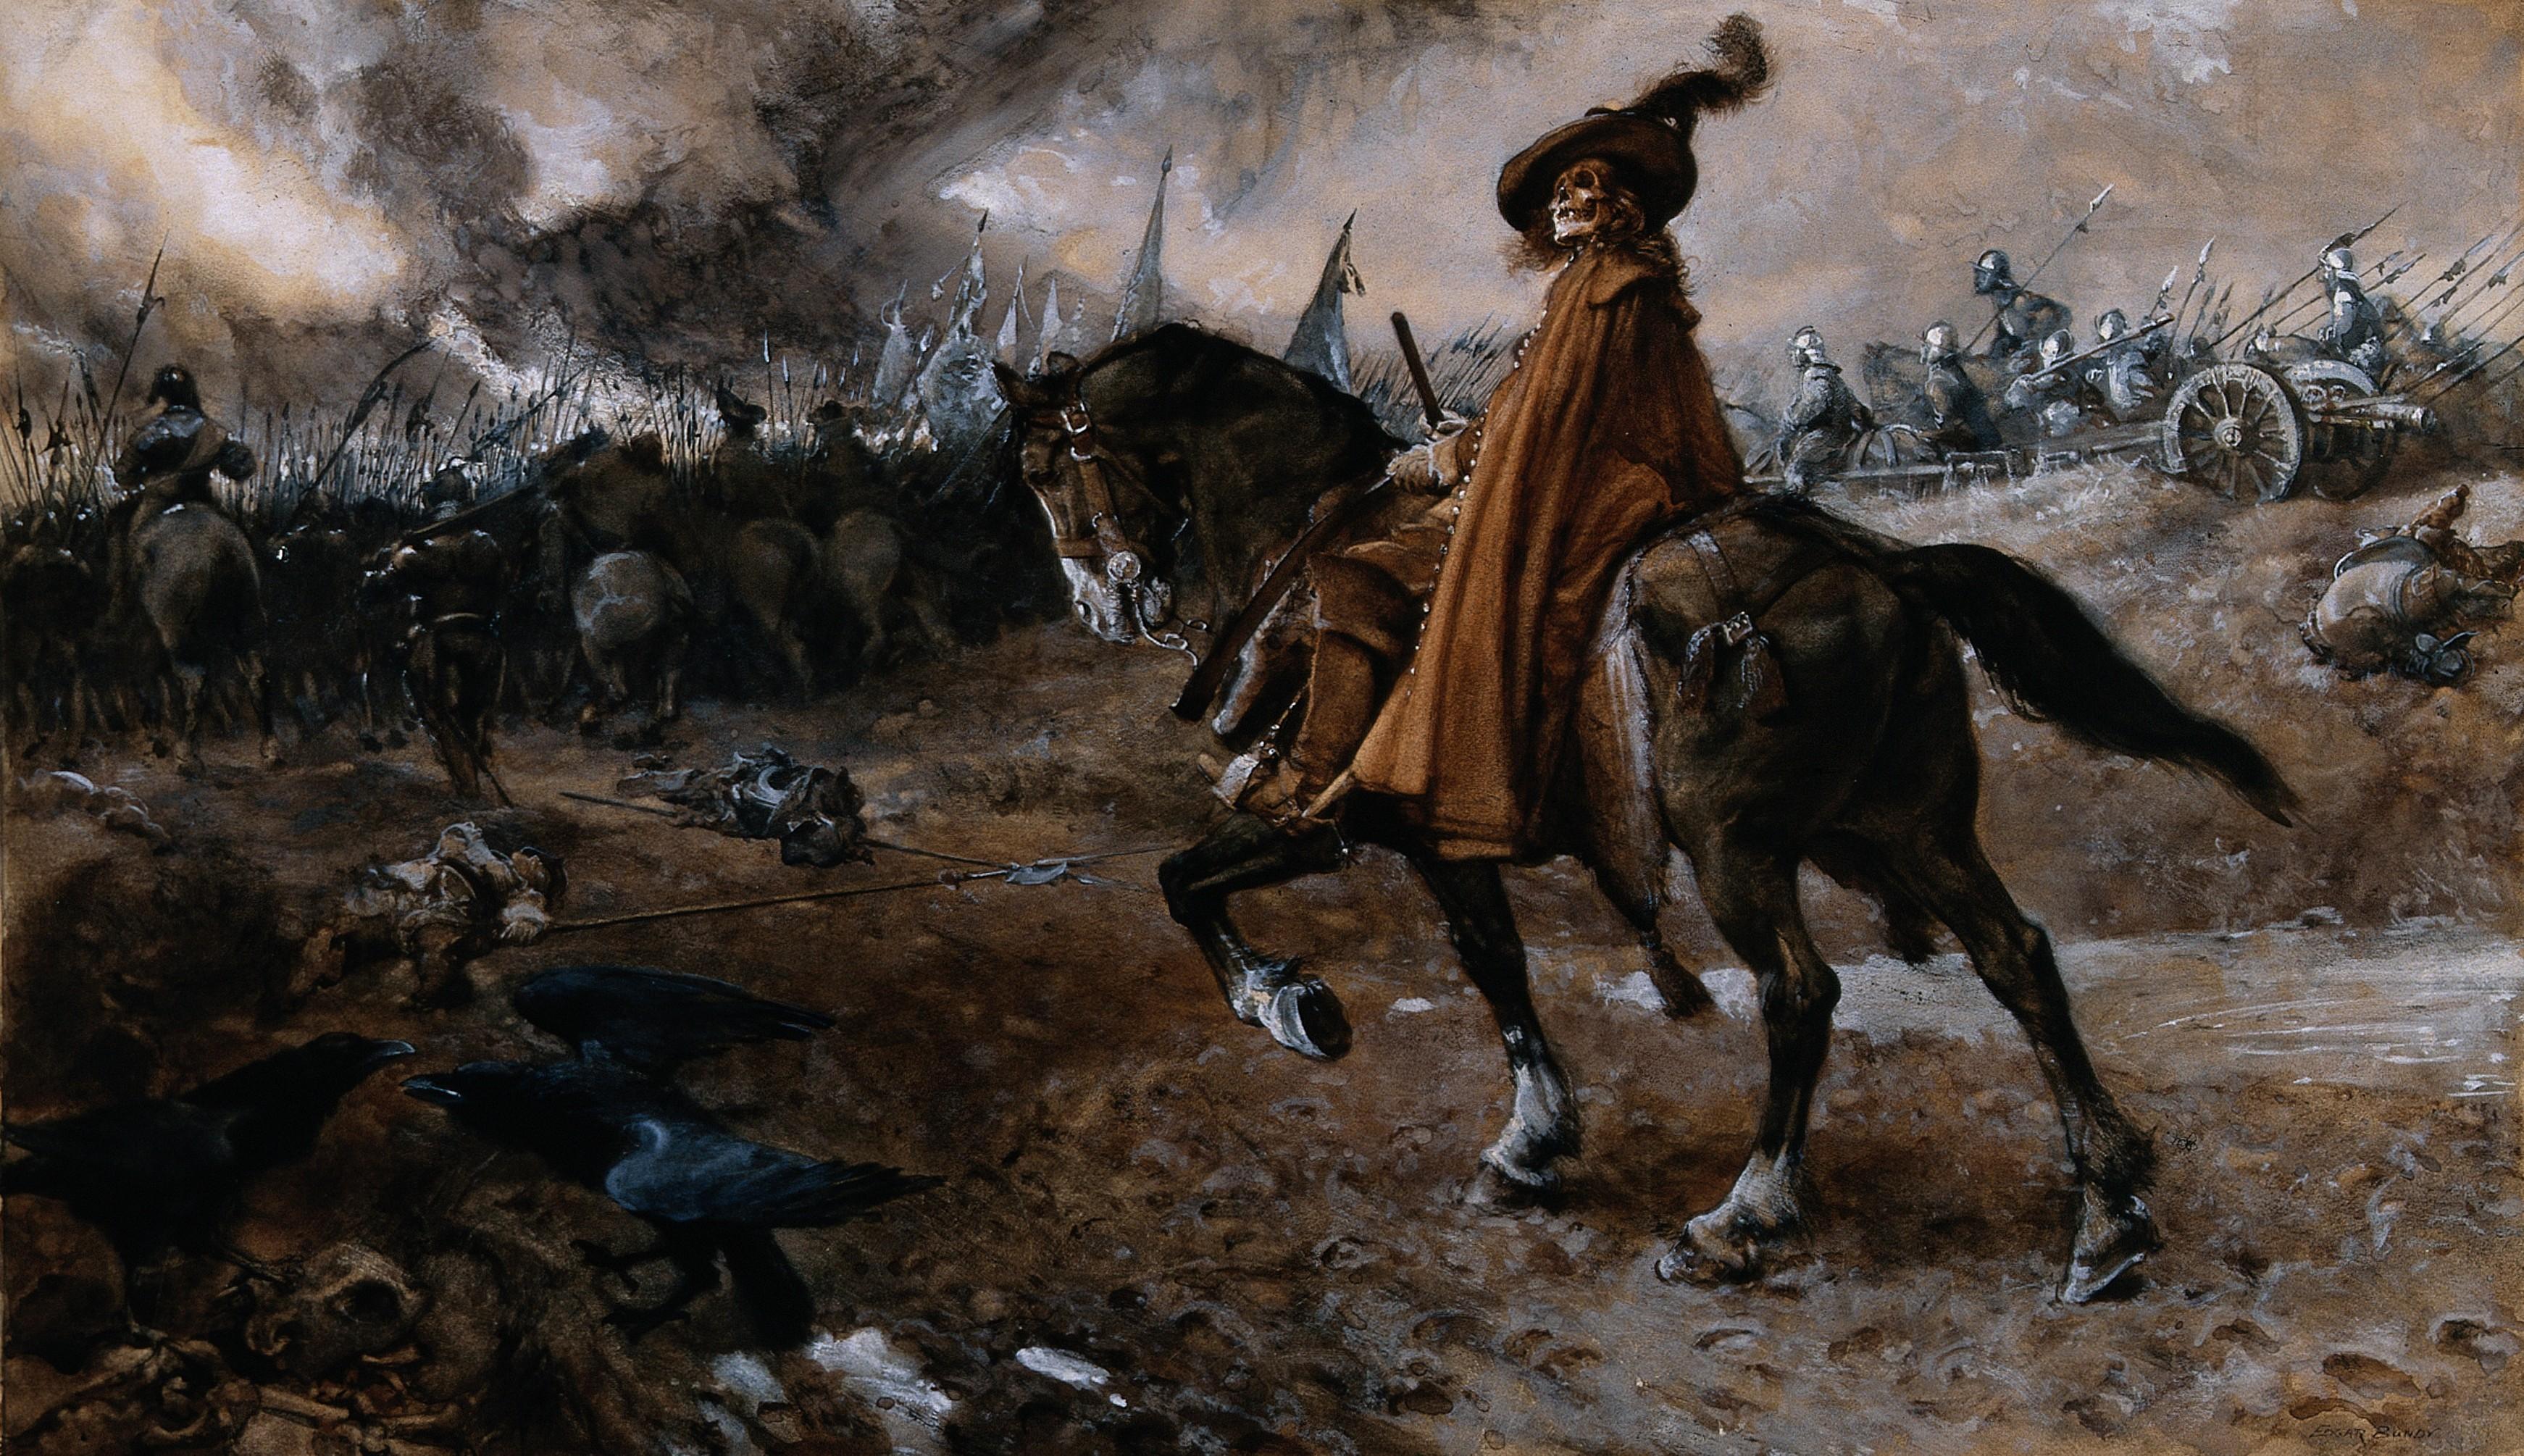 skeleton riding a horse into battle